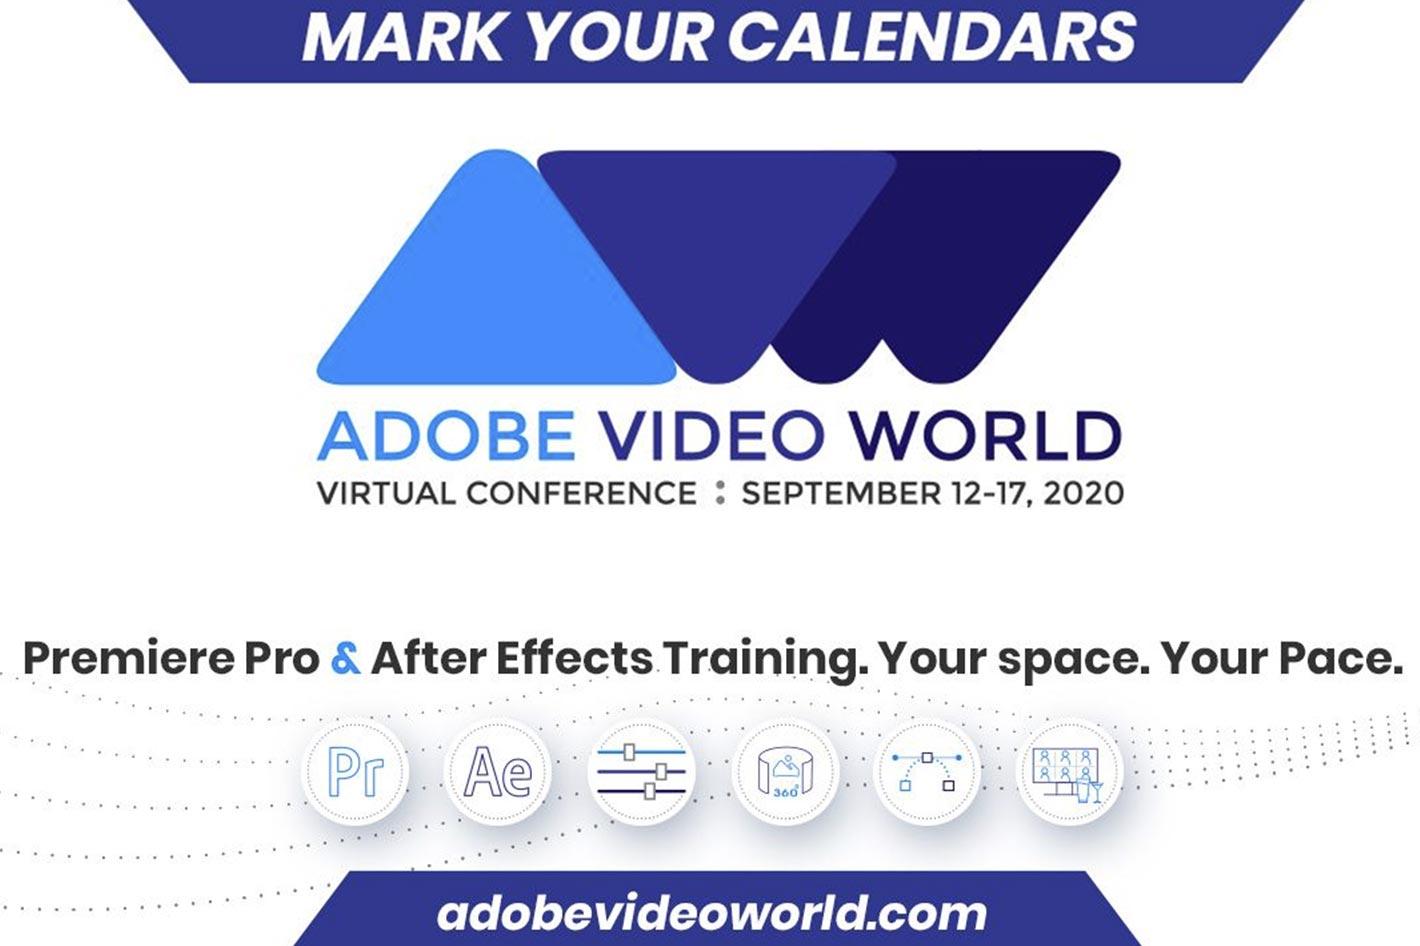 Adobe Video World Online comes in September